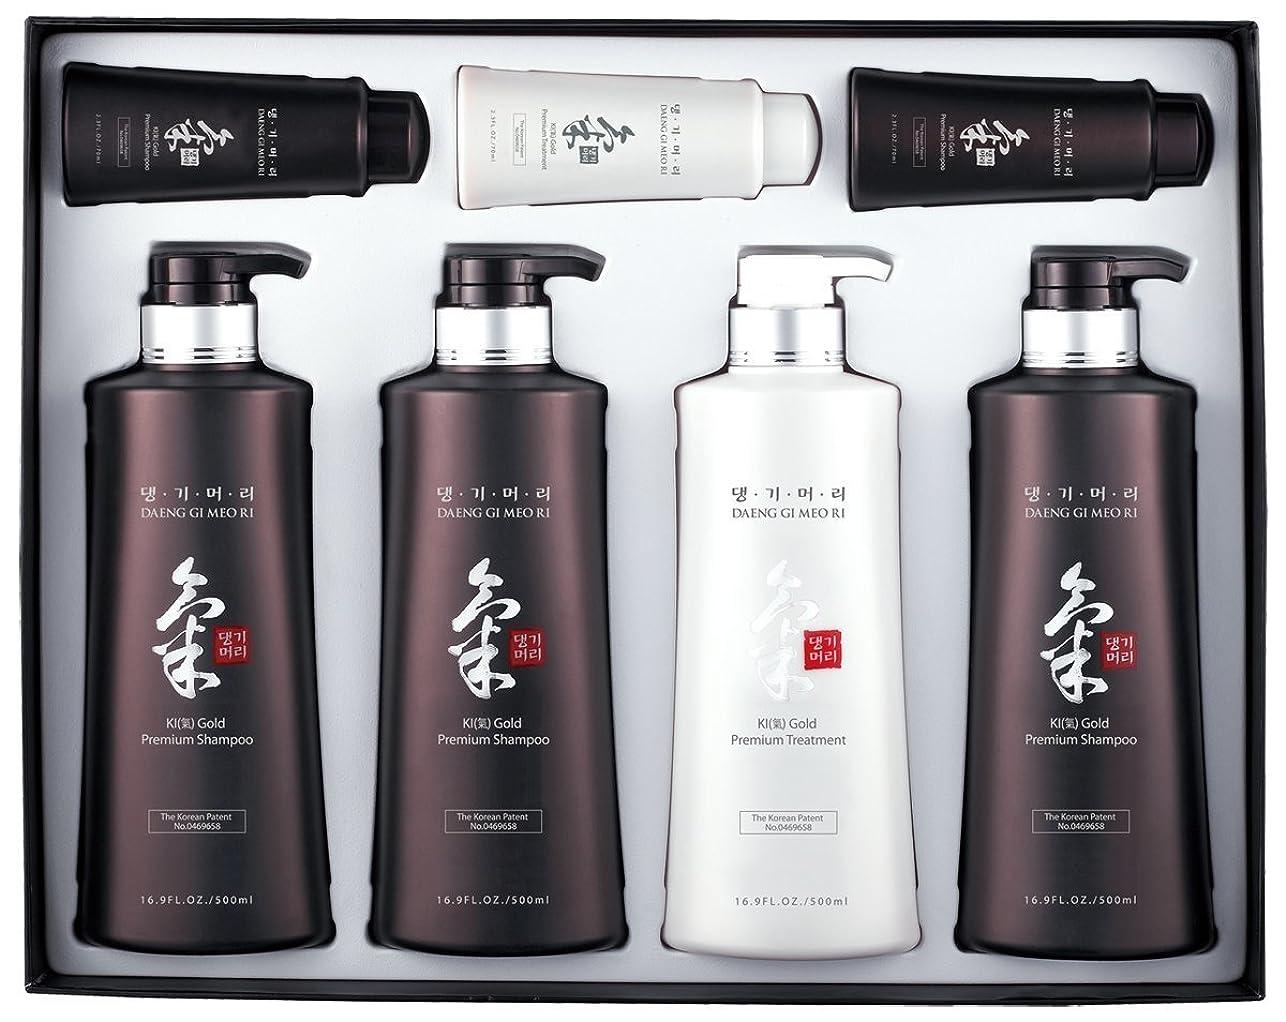 Doori Cosmetics, South Korea デーンGiのメオRiを(箱なし)のKiゴールドプレミアム特別ヘアケア4本セット